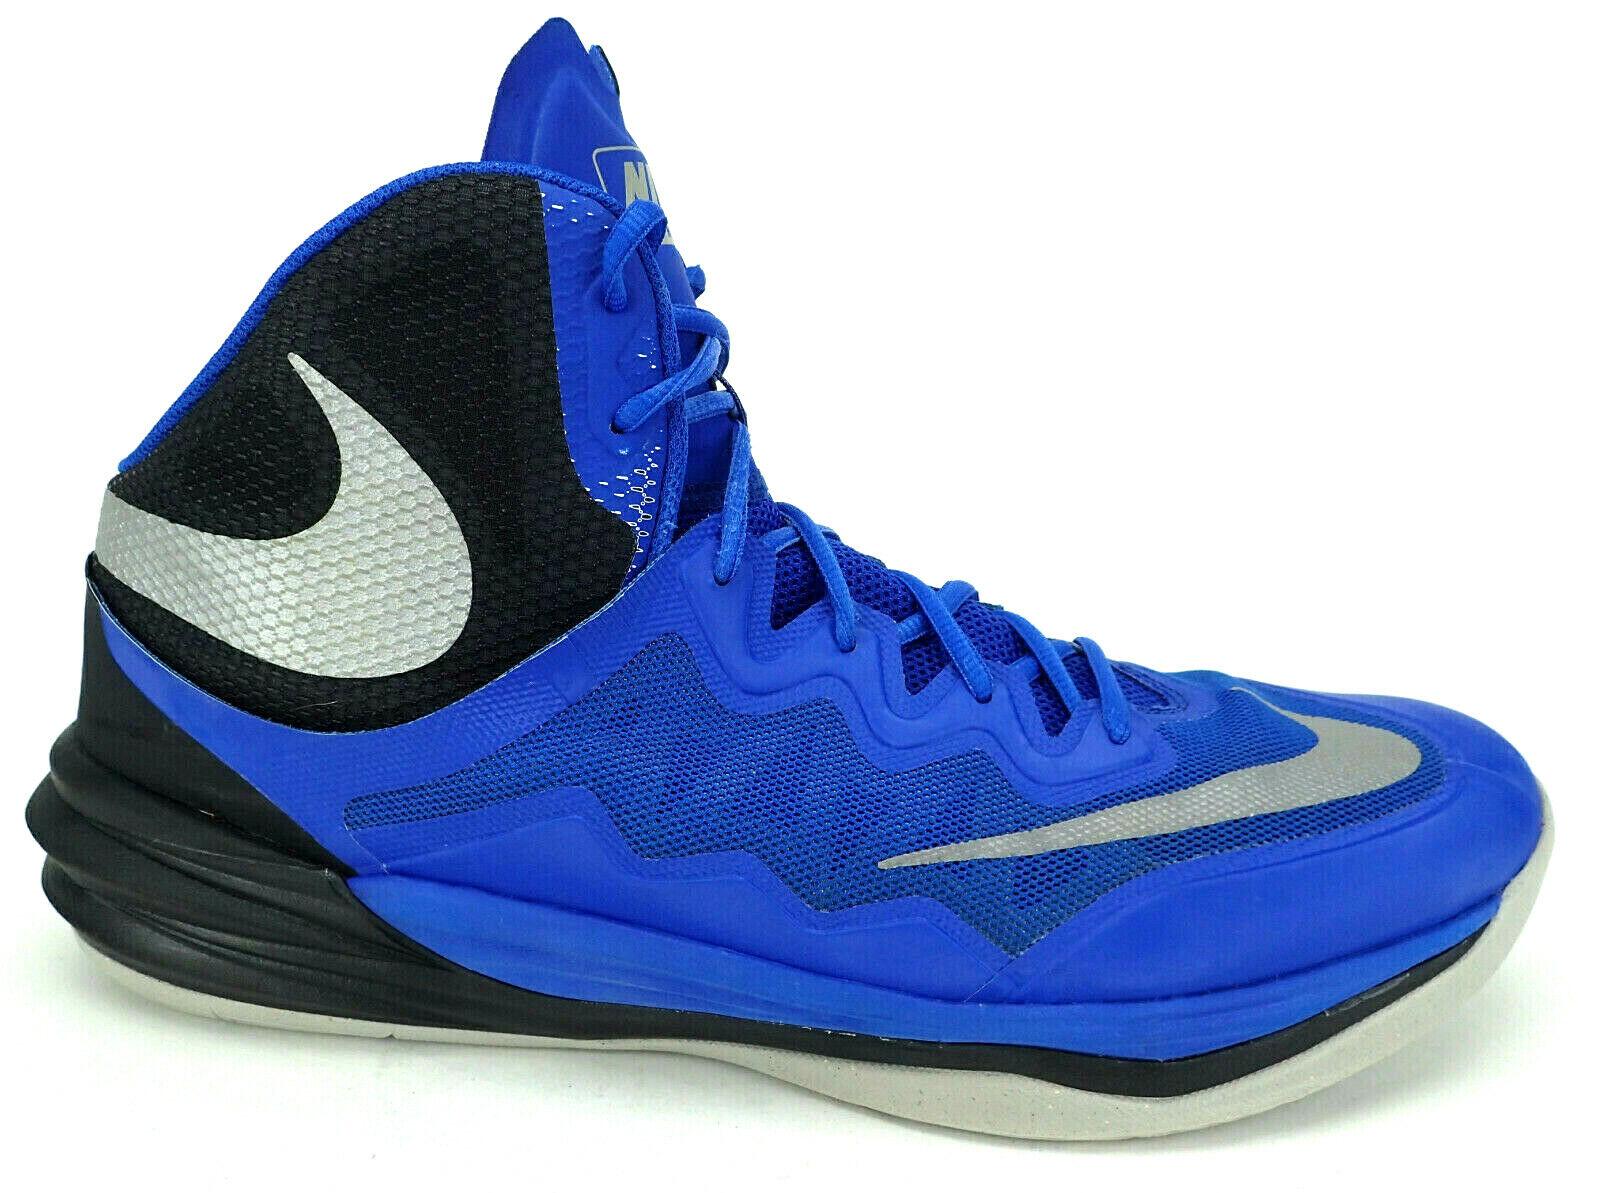 Nike Prime Hype DF II Basketball